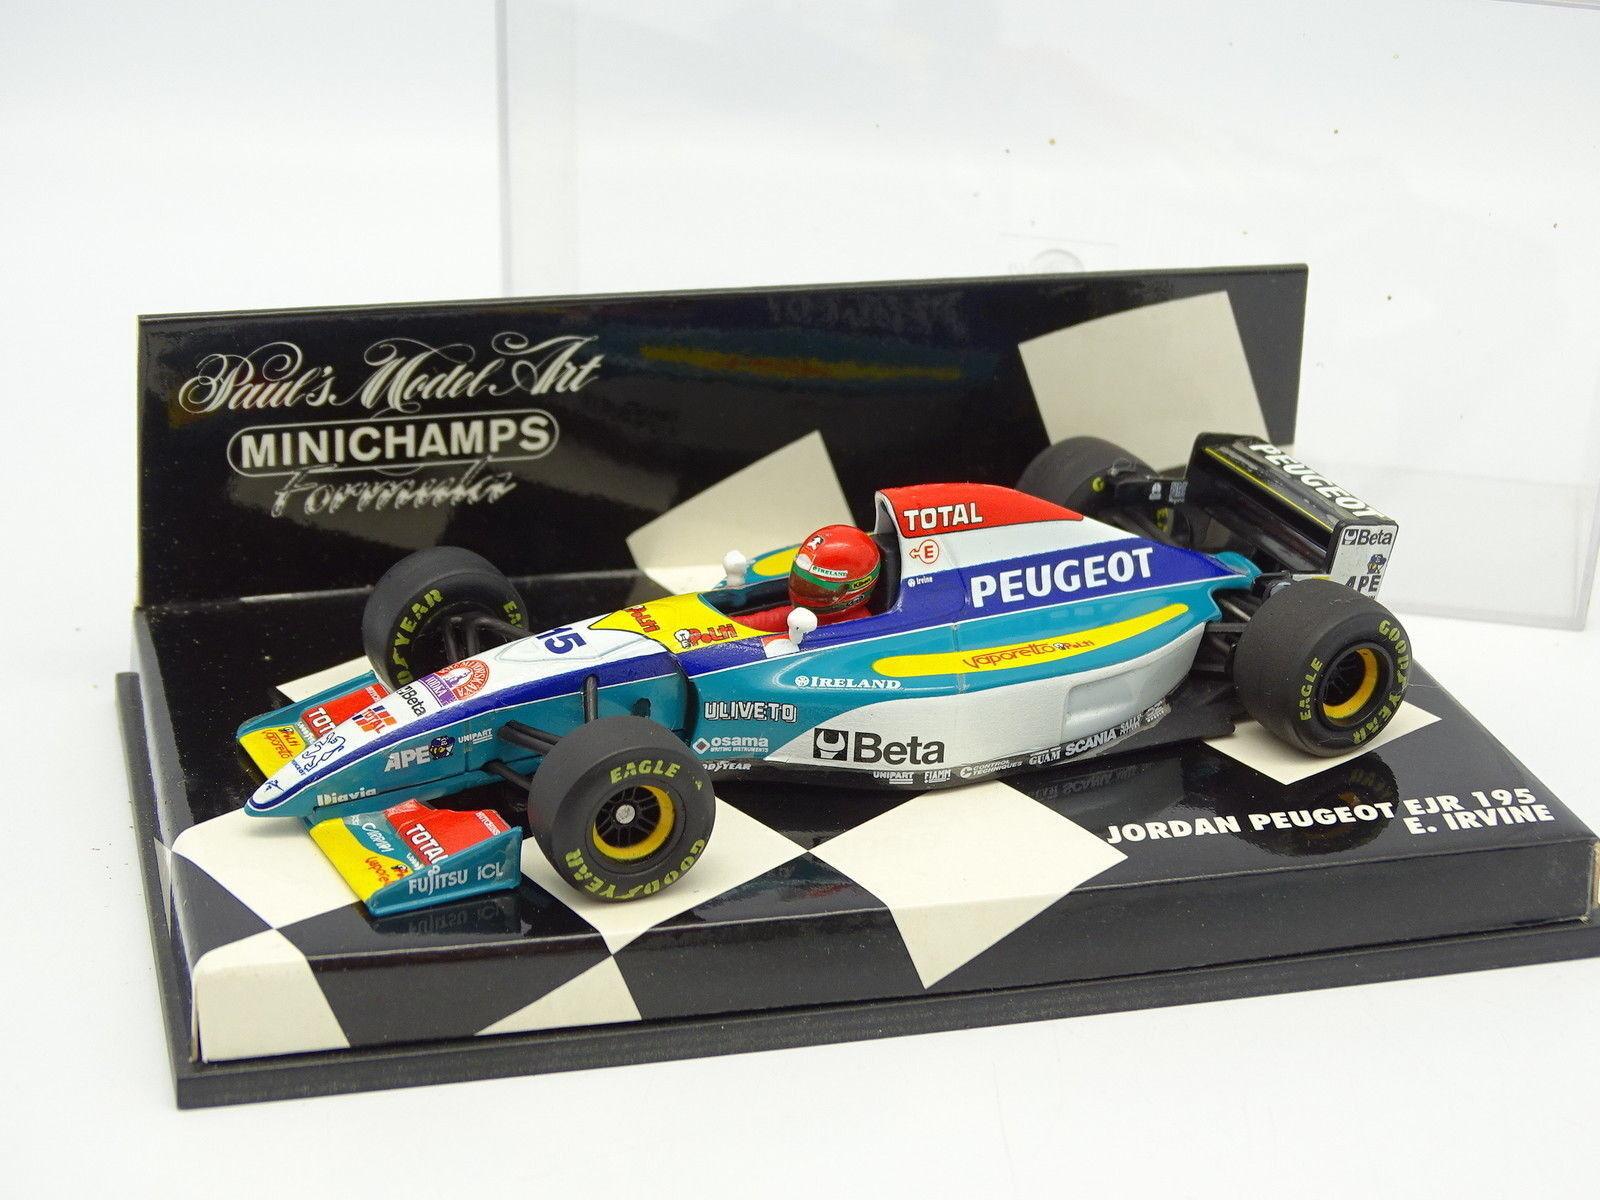 Minichamps 1 43 - F1 Jordan Peugeot EJR 195 Irvine